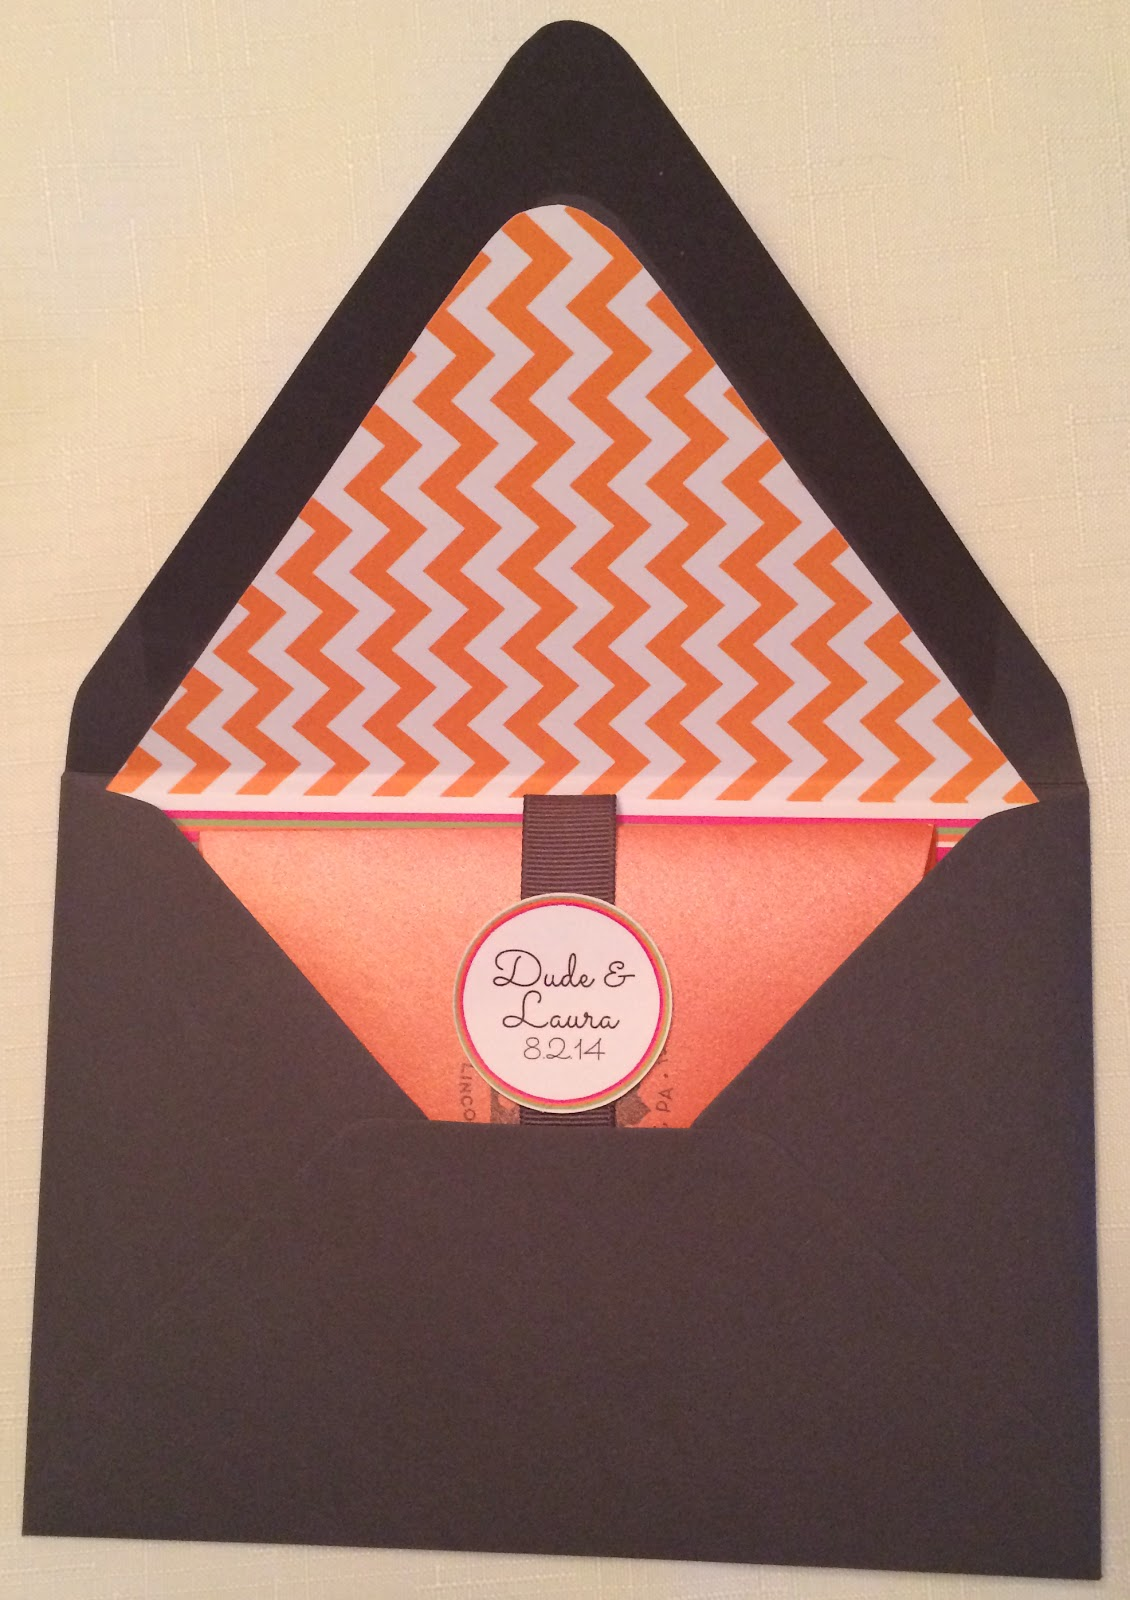 Doeblerghini Bunch:  Wedding Invite Details - Envelope Lined